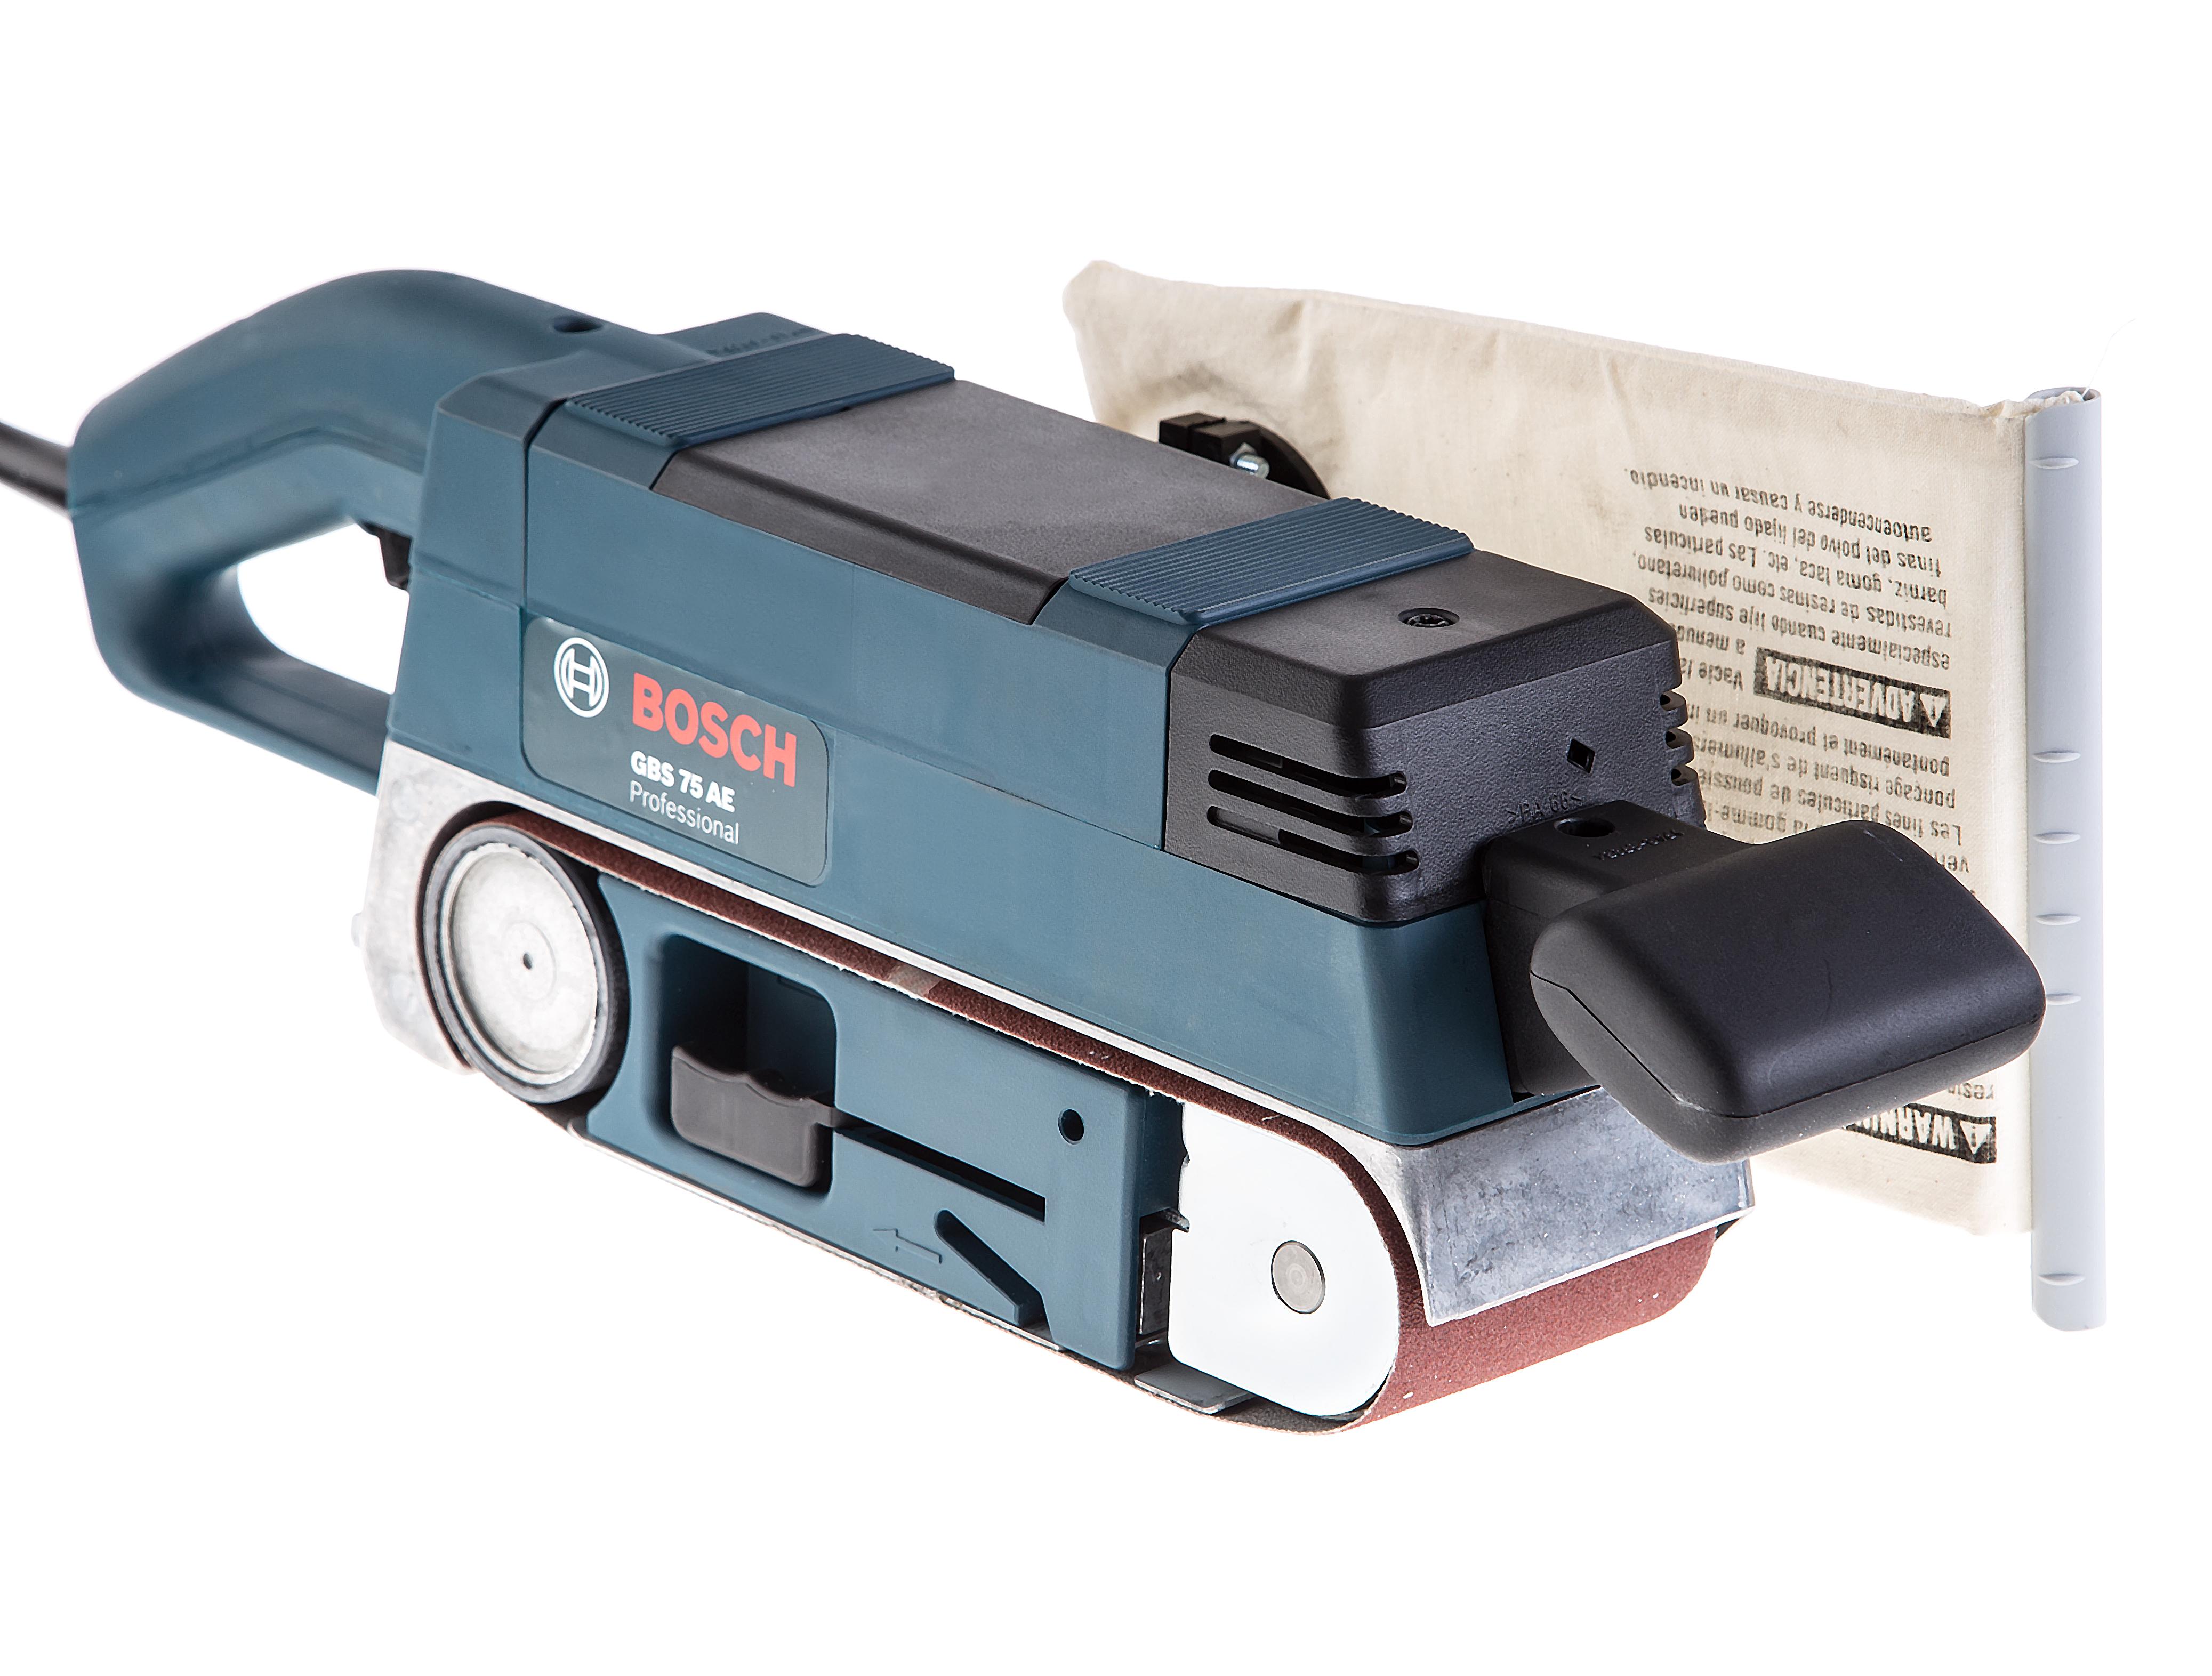 Машинка шлифовальная ленточная Bosch Gbs 75 ae (0.601.274.708)